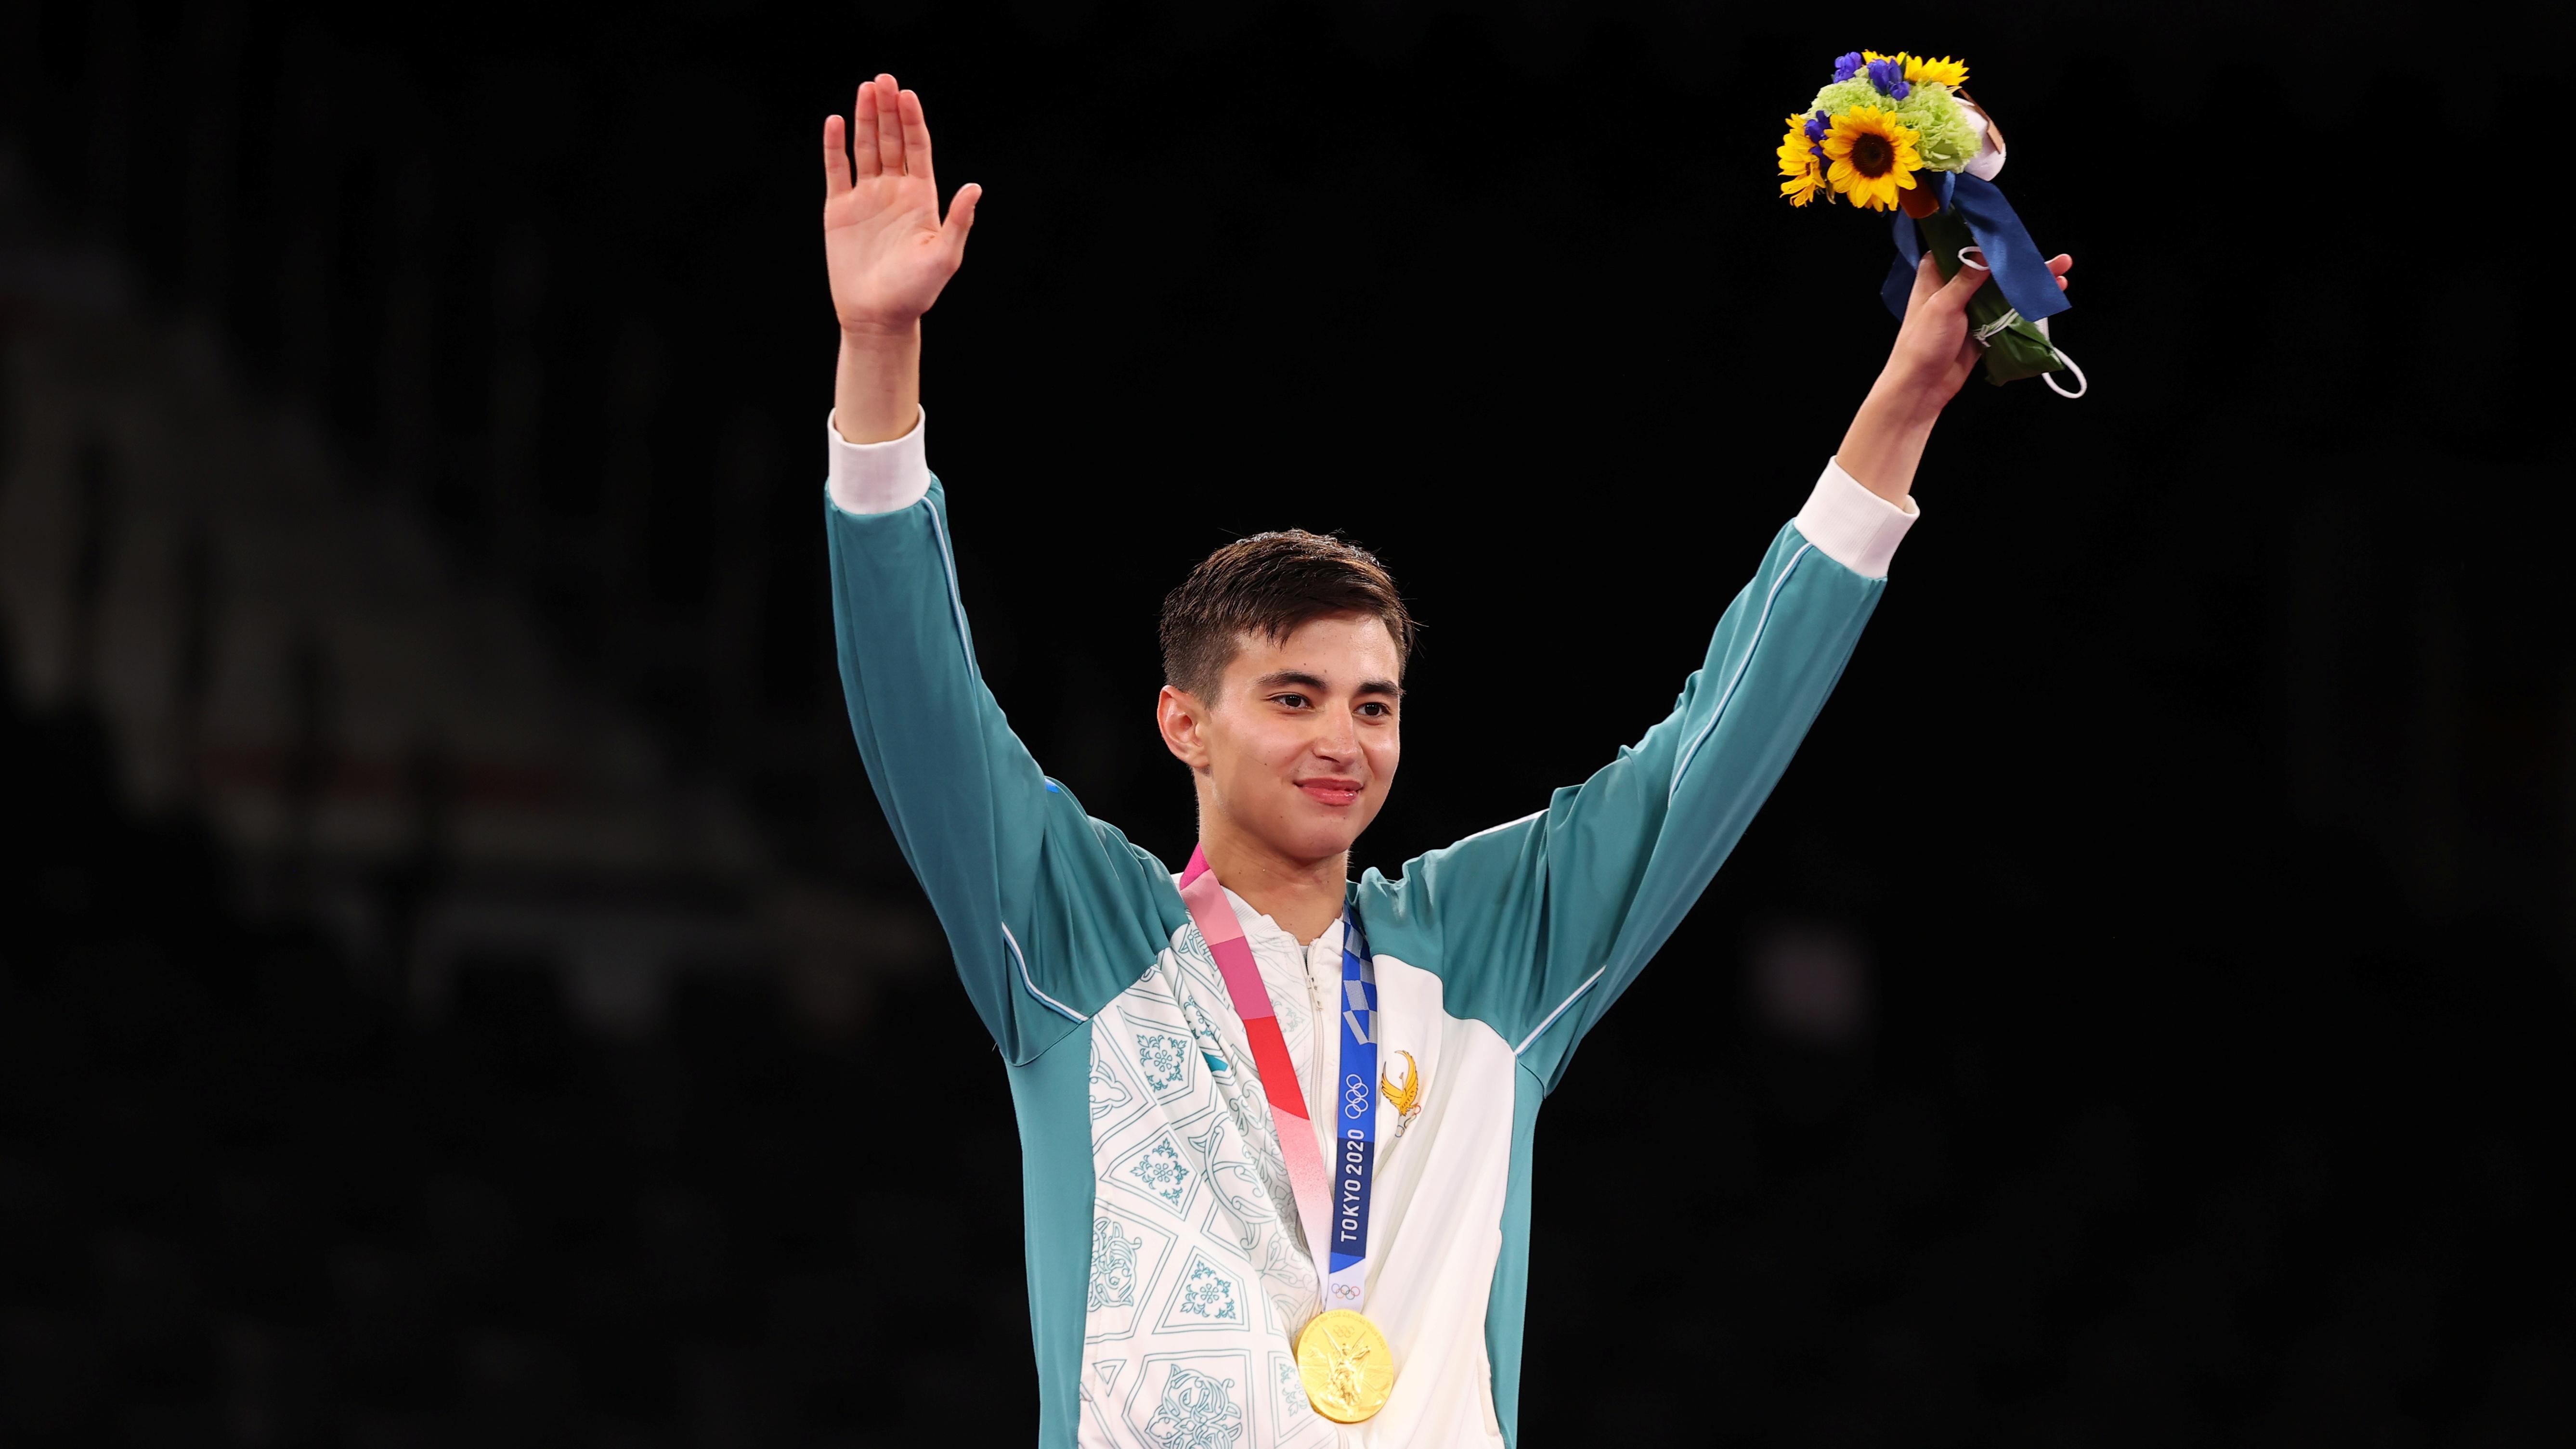 Tokyo 2020 Olympics - Taekwondo - Men's Featherweight 58-68kg - Medal Ceremony - Makuhari Messe Hall A, Chiba, Japan - July 25, 2021. Ulugbek Rashitov of Uzbekistan celebrates after winning gold REUTERS/Murad Sezer